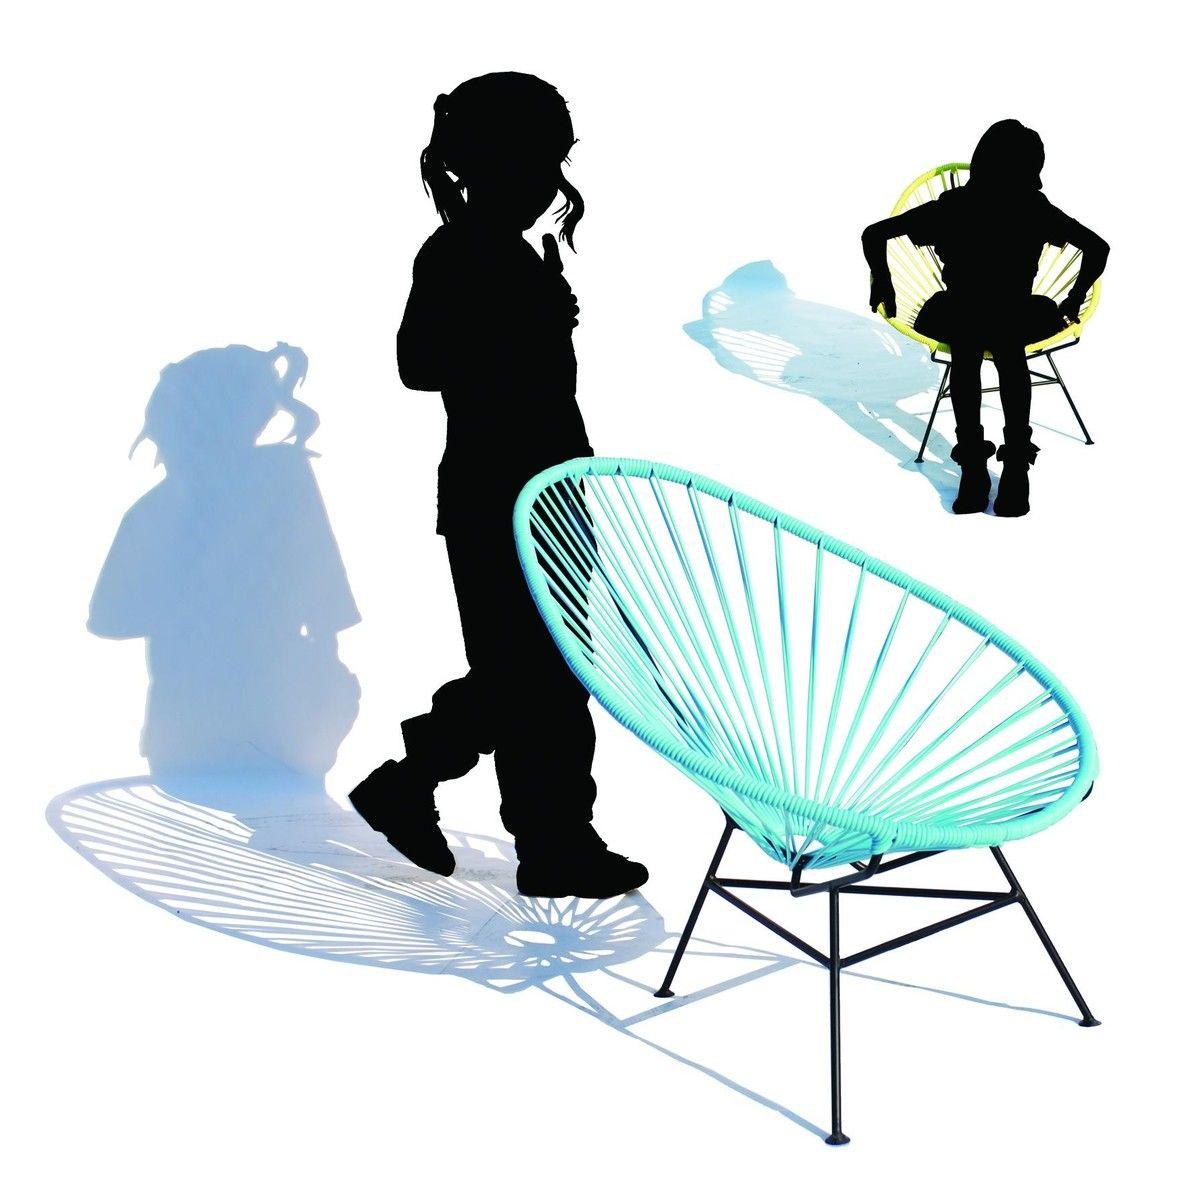 acapulco mini chair fauteuil enfant ok design. Black Bedroom Furniture Sets. Home Design Ideas